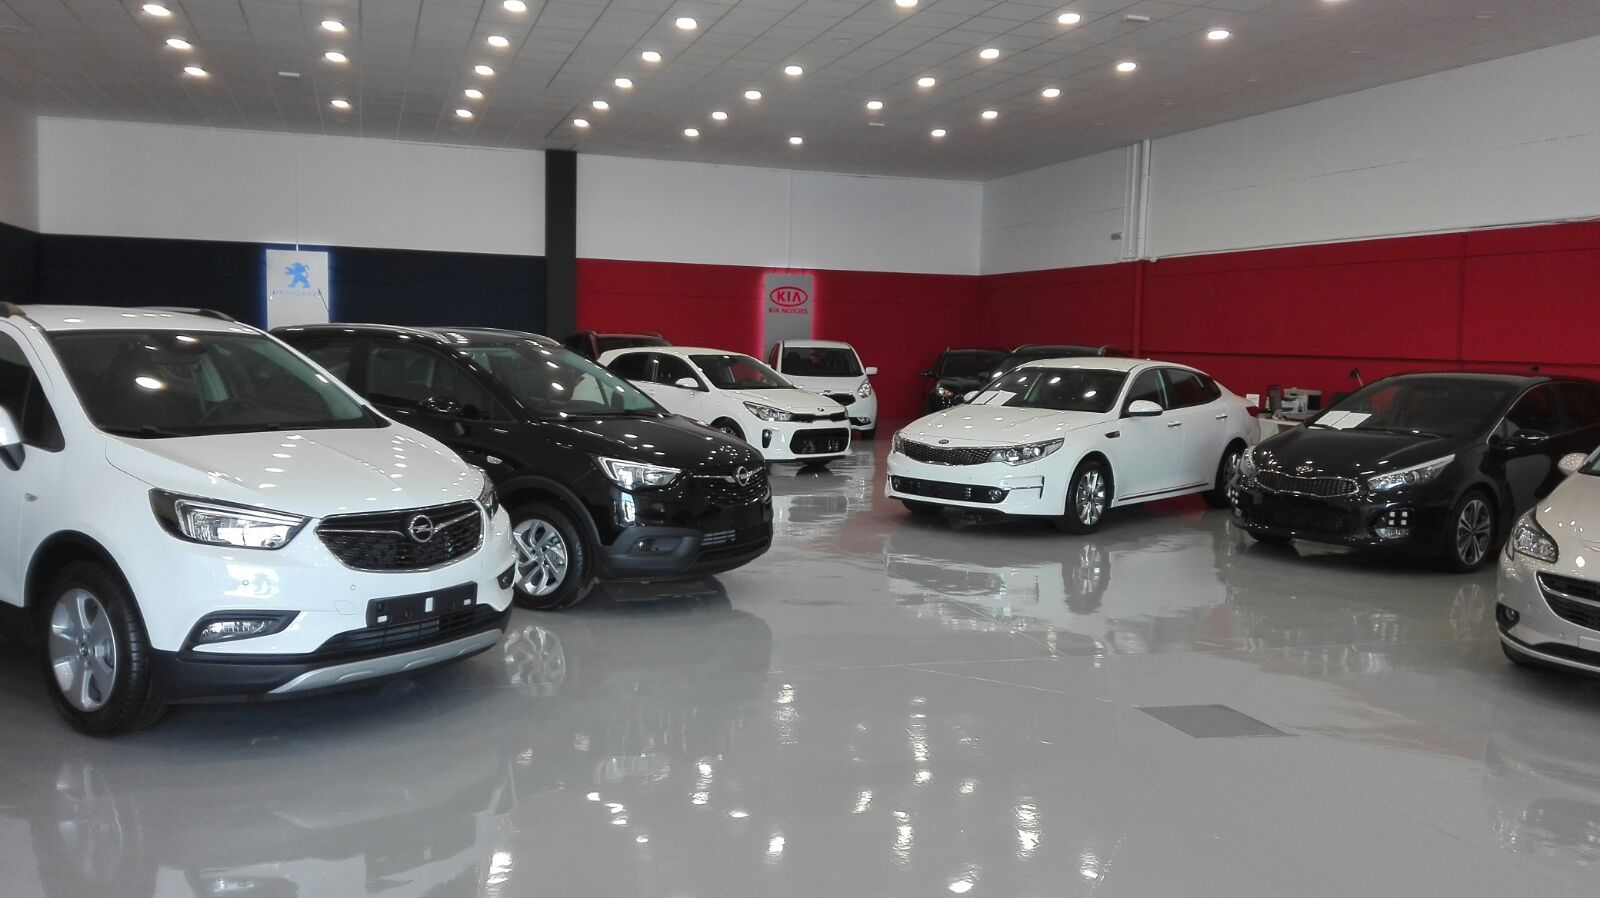 Reformas en garajes en Cádiz